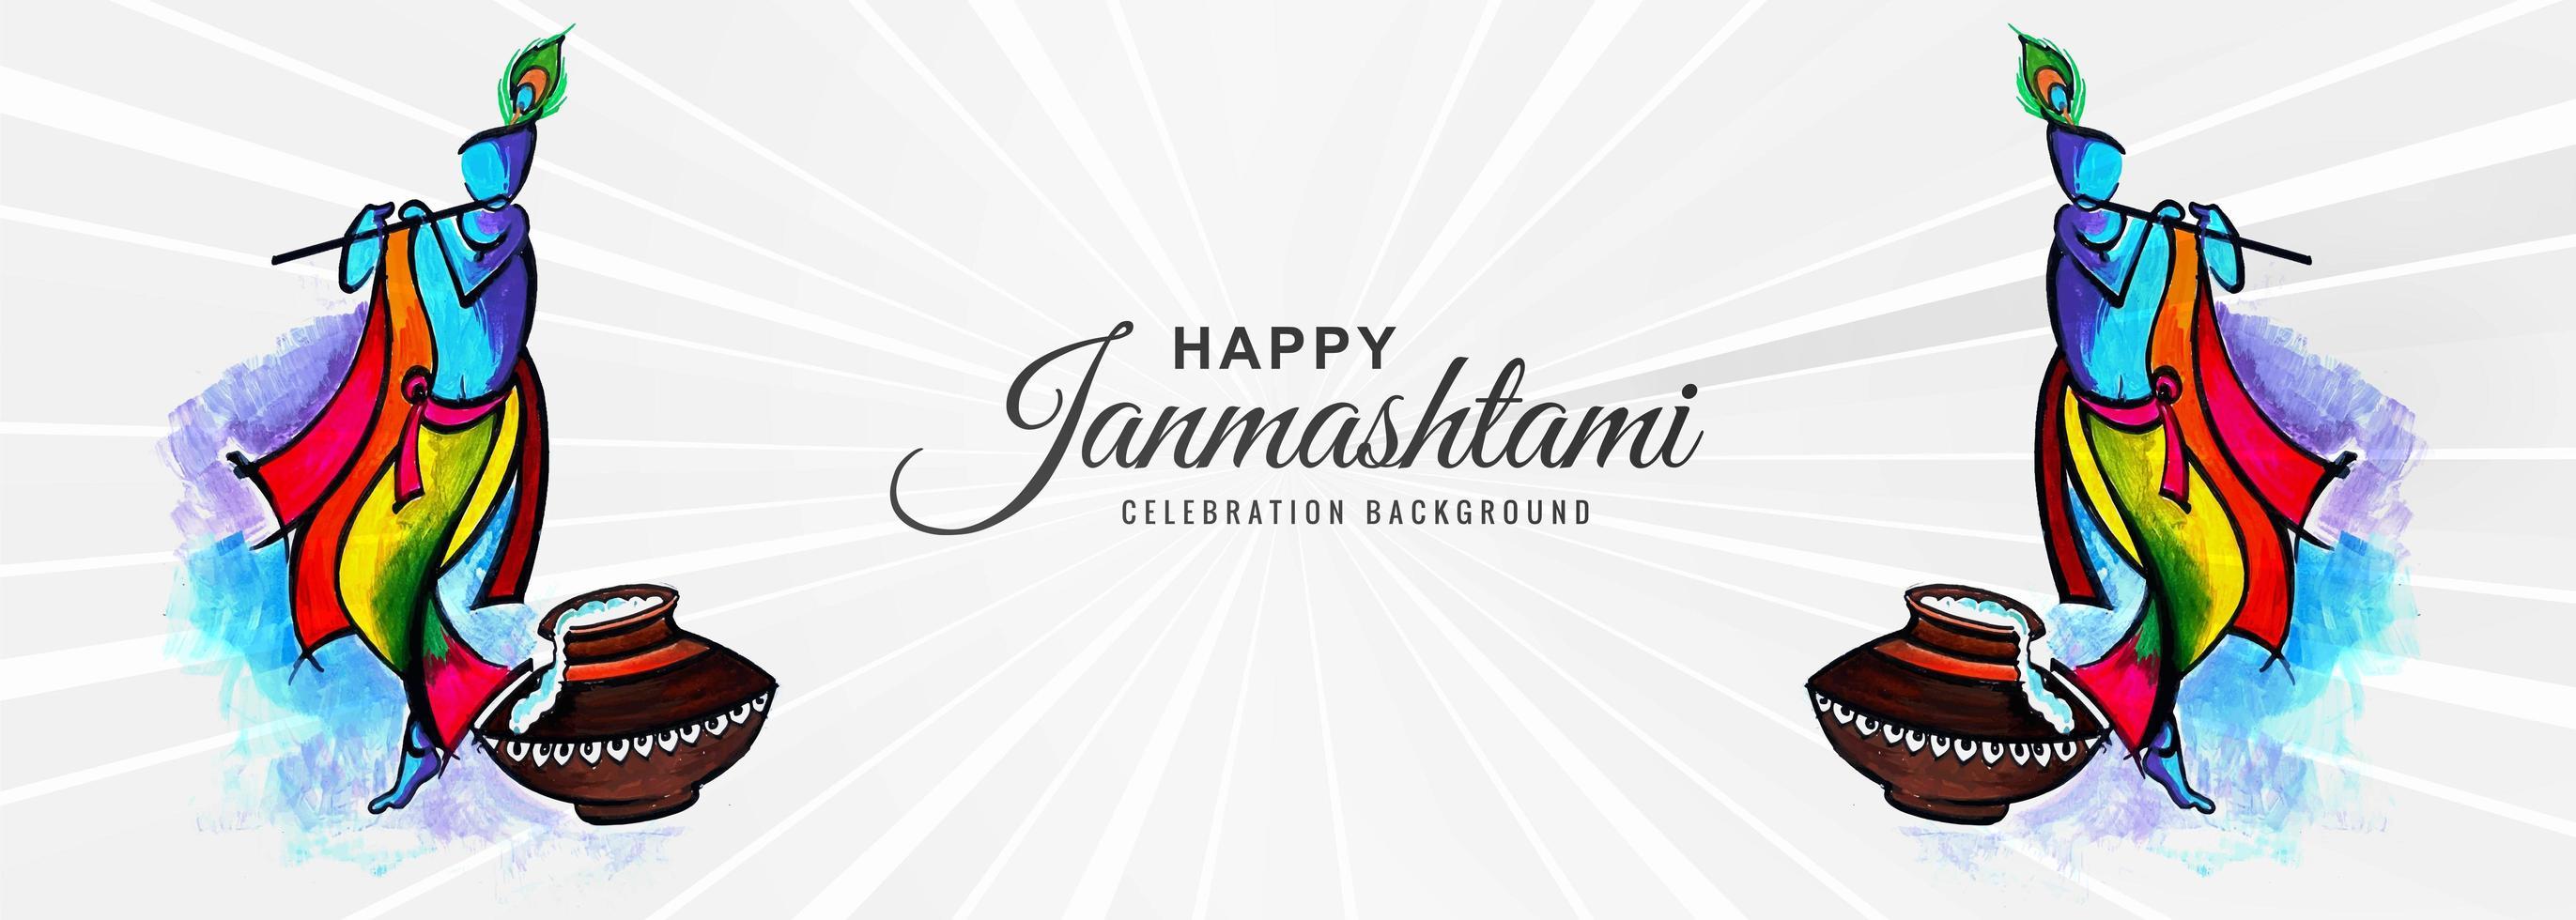 shree krishna janmashtami festival grijze zonnestraal banner vector